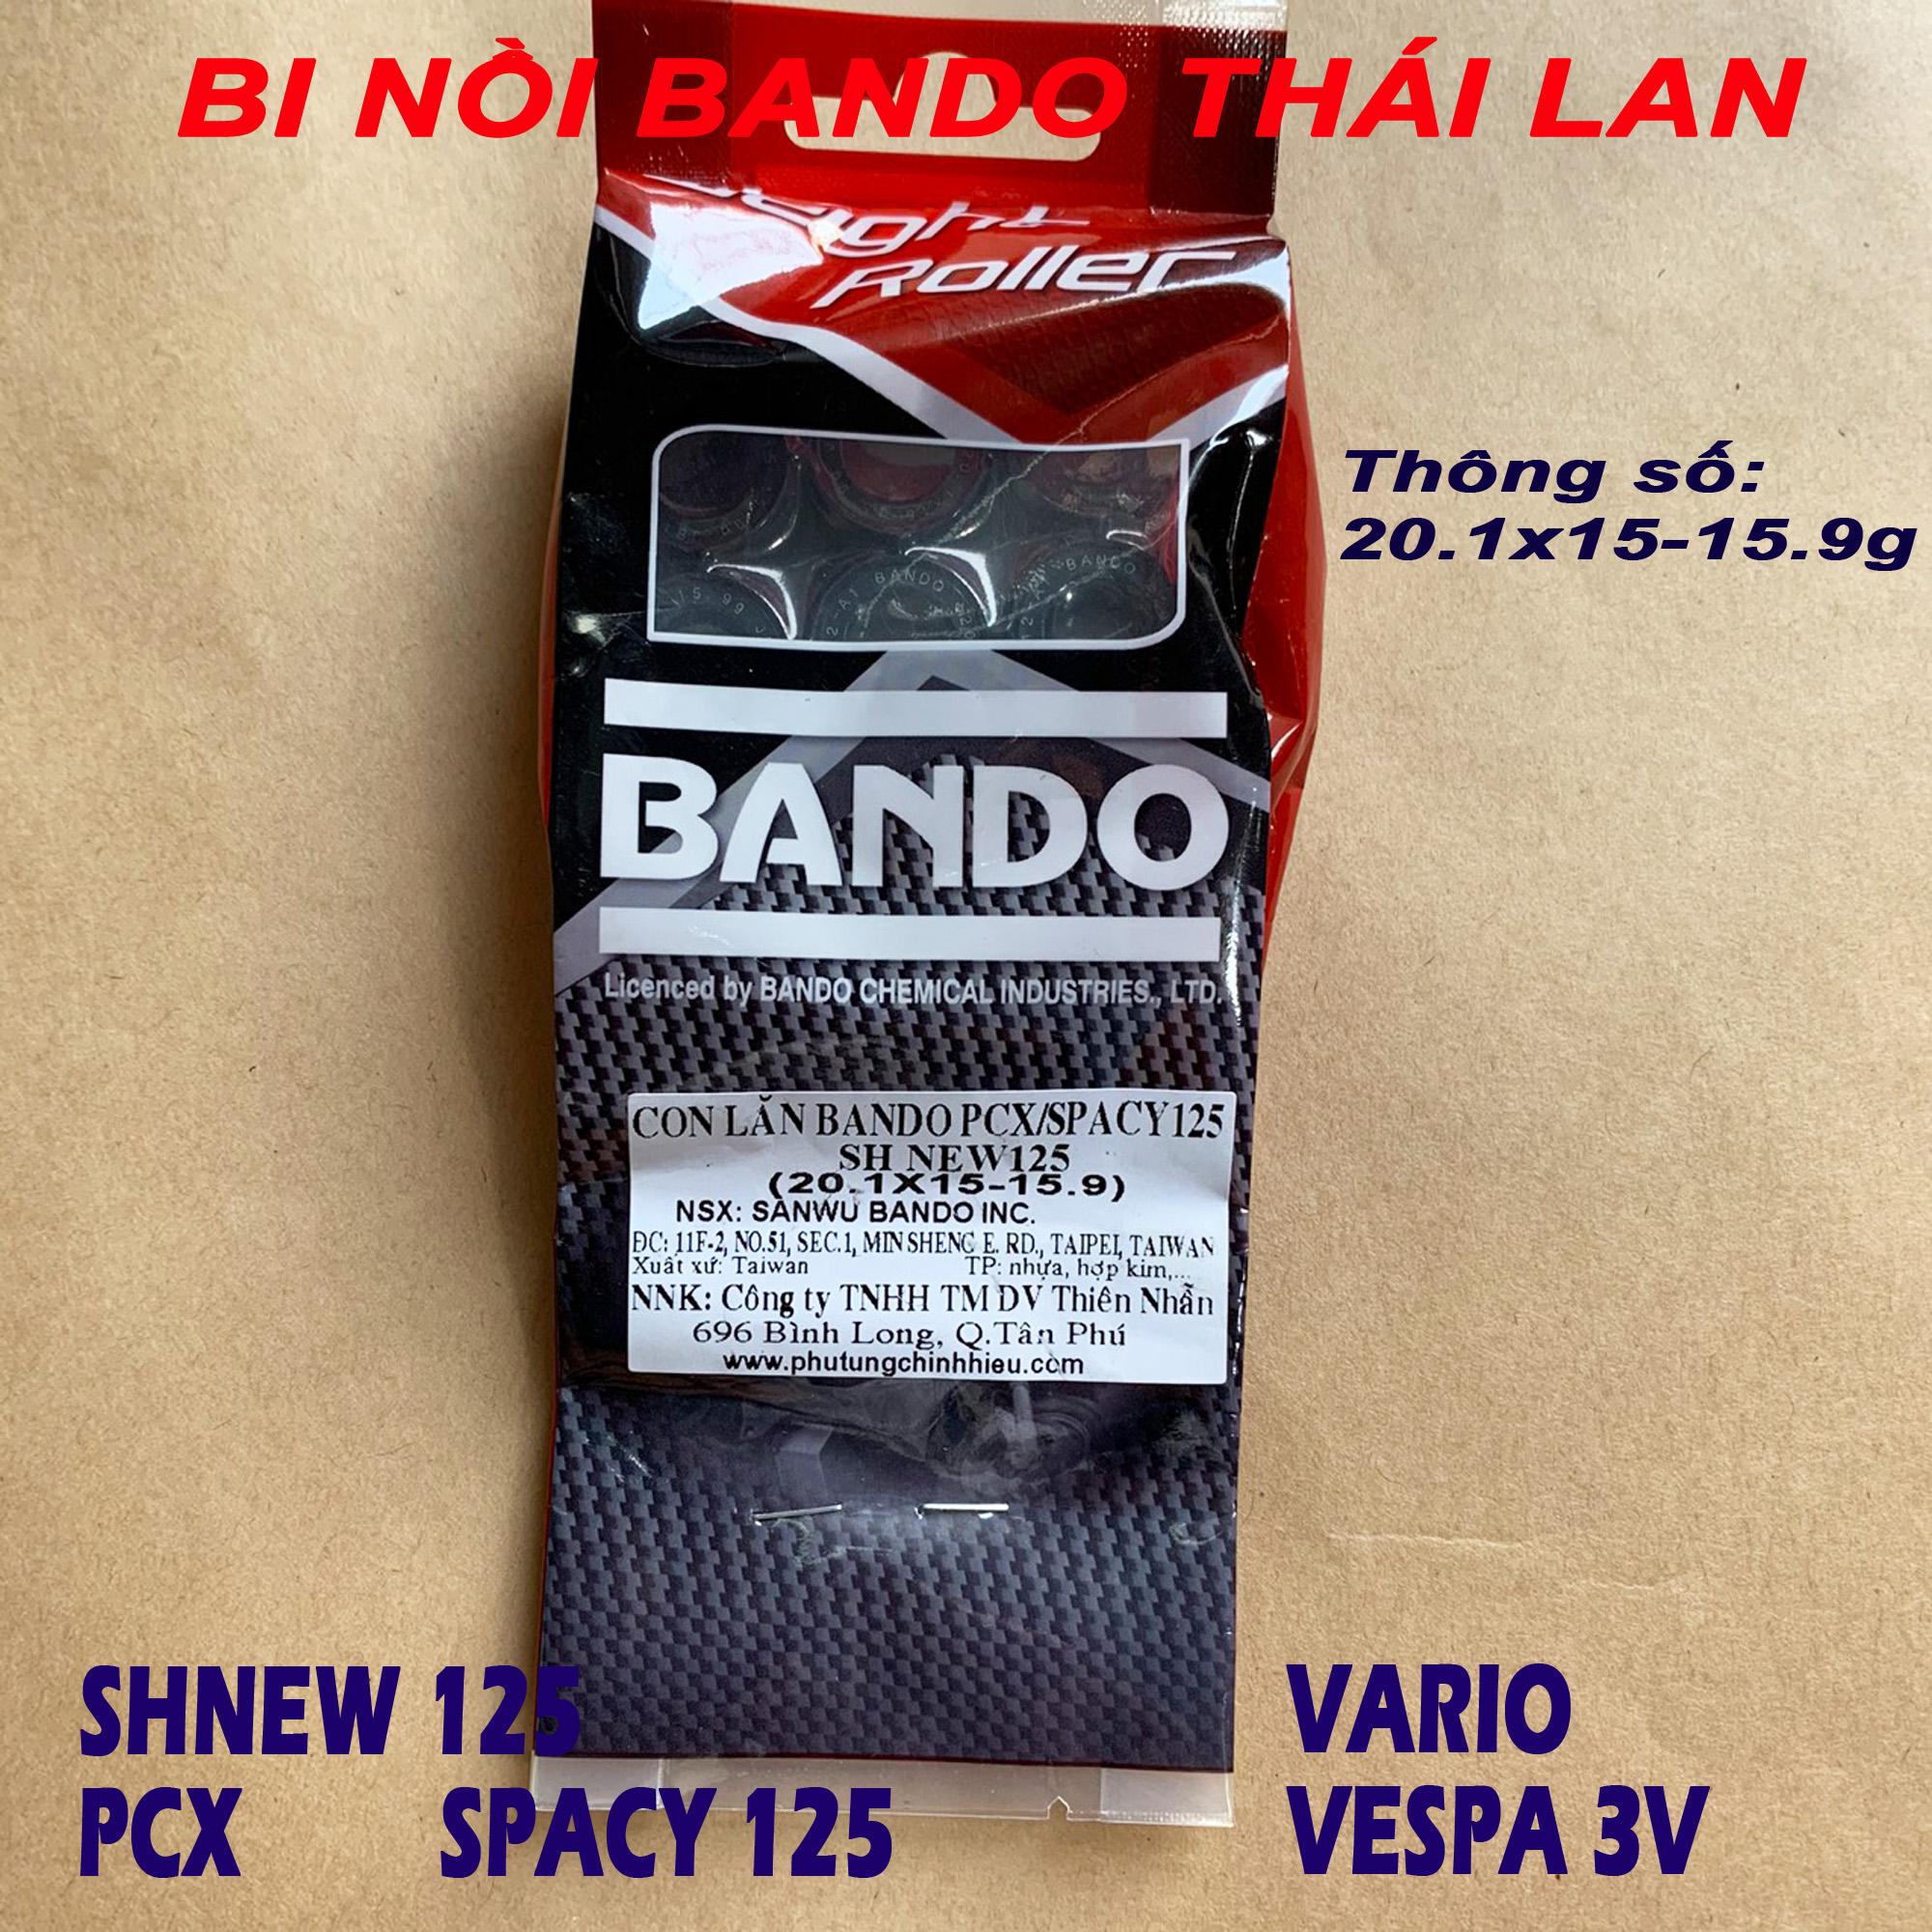 Bi nồi bando 15.9g cho Honda Vario PCX SHNew 125 Spacy 125 - Thái Lan